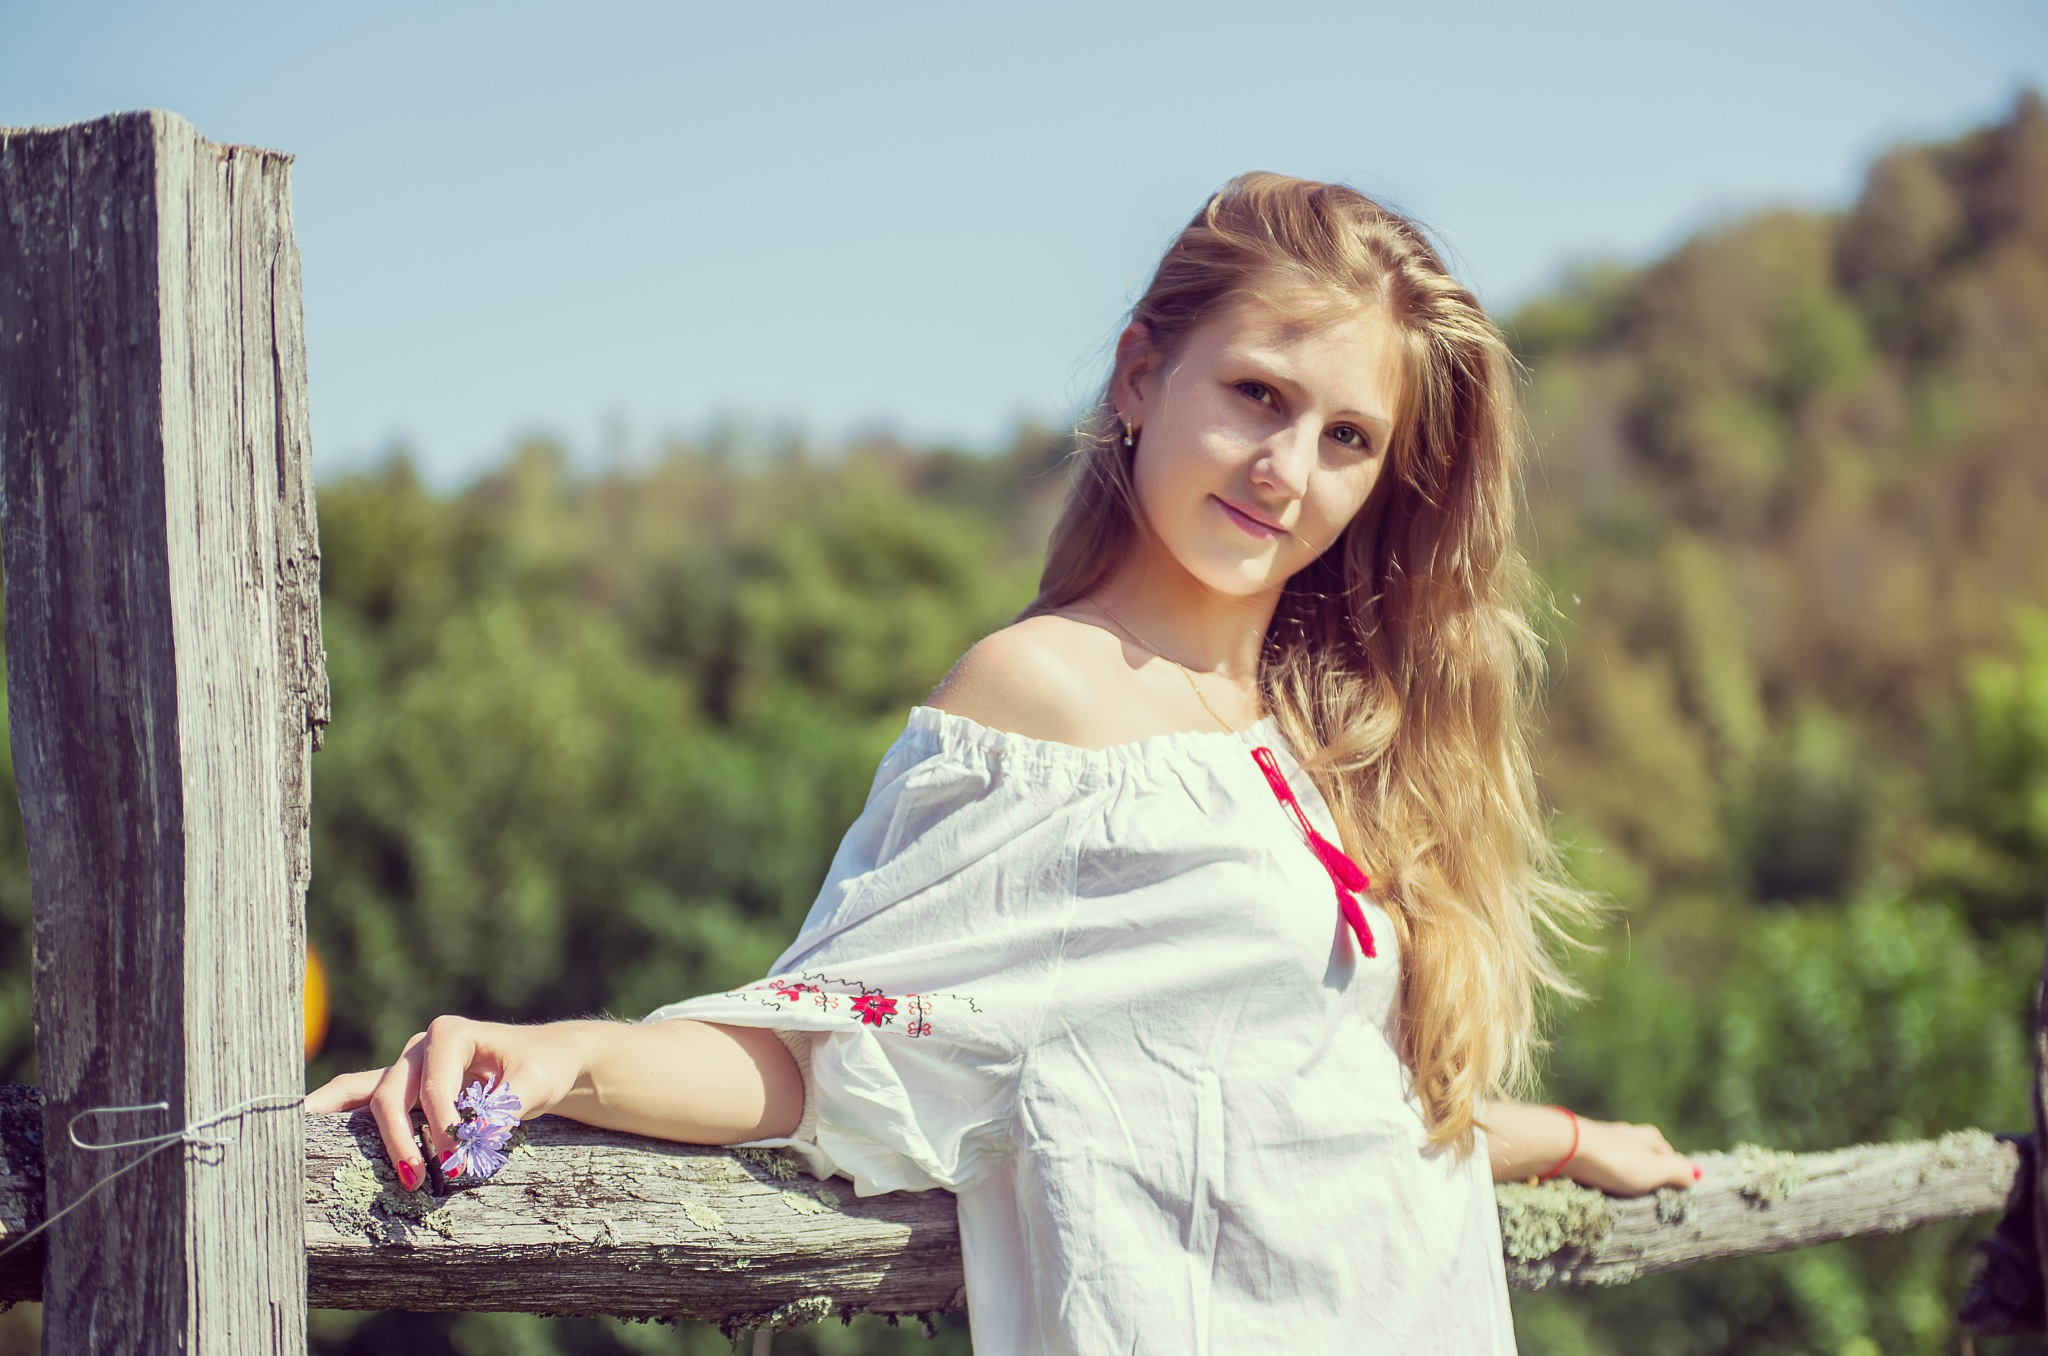 Lena by Roman Prikhodko